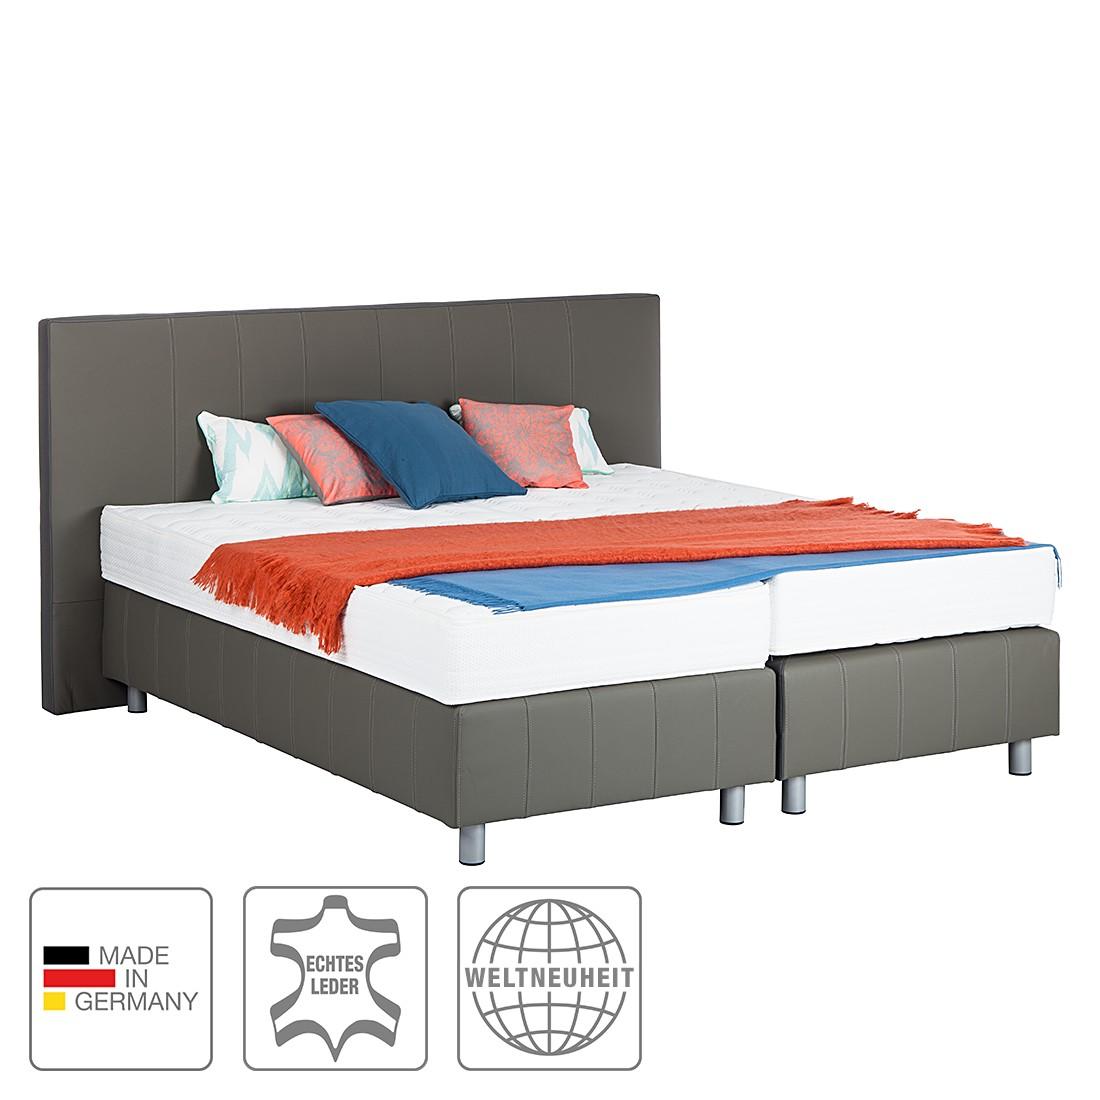 Boxspringbett Atlanta (Echtleder) - Ohne Topper - 180 x 200cm - H2 bis 80 kg - Grau, Art of Sleep